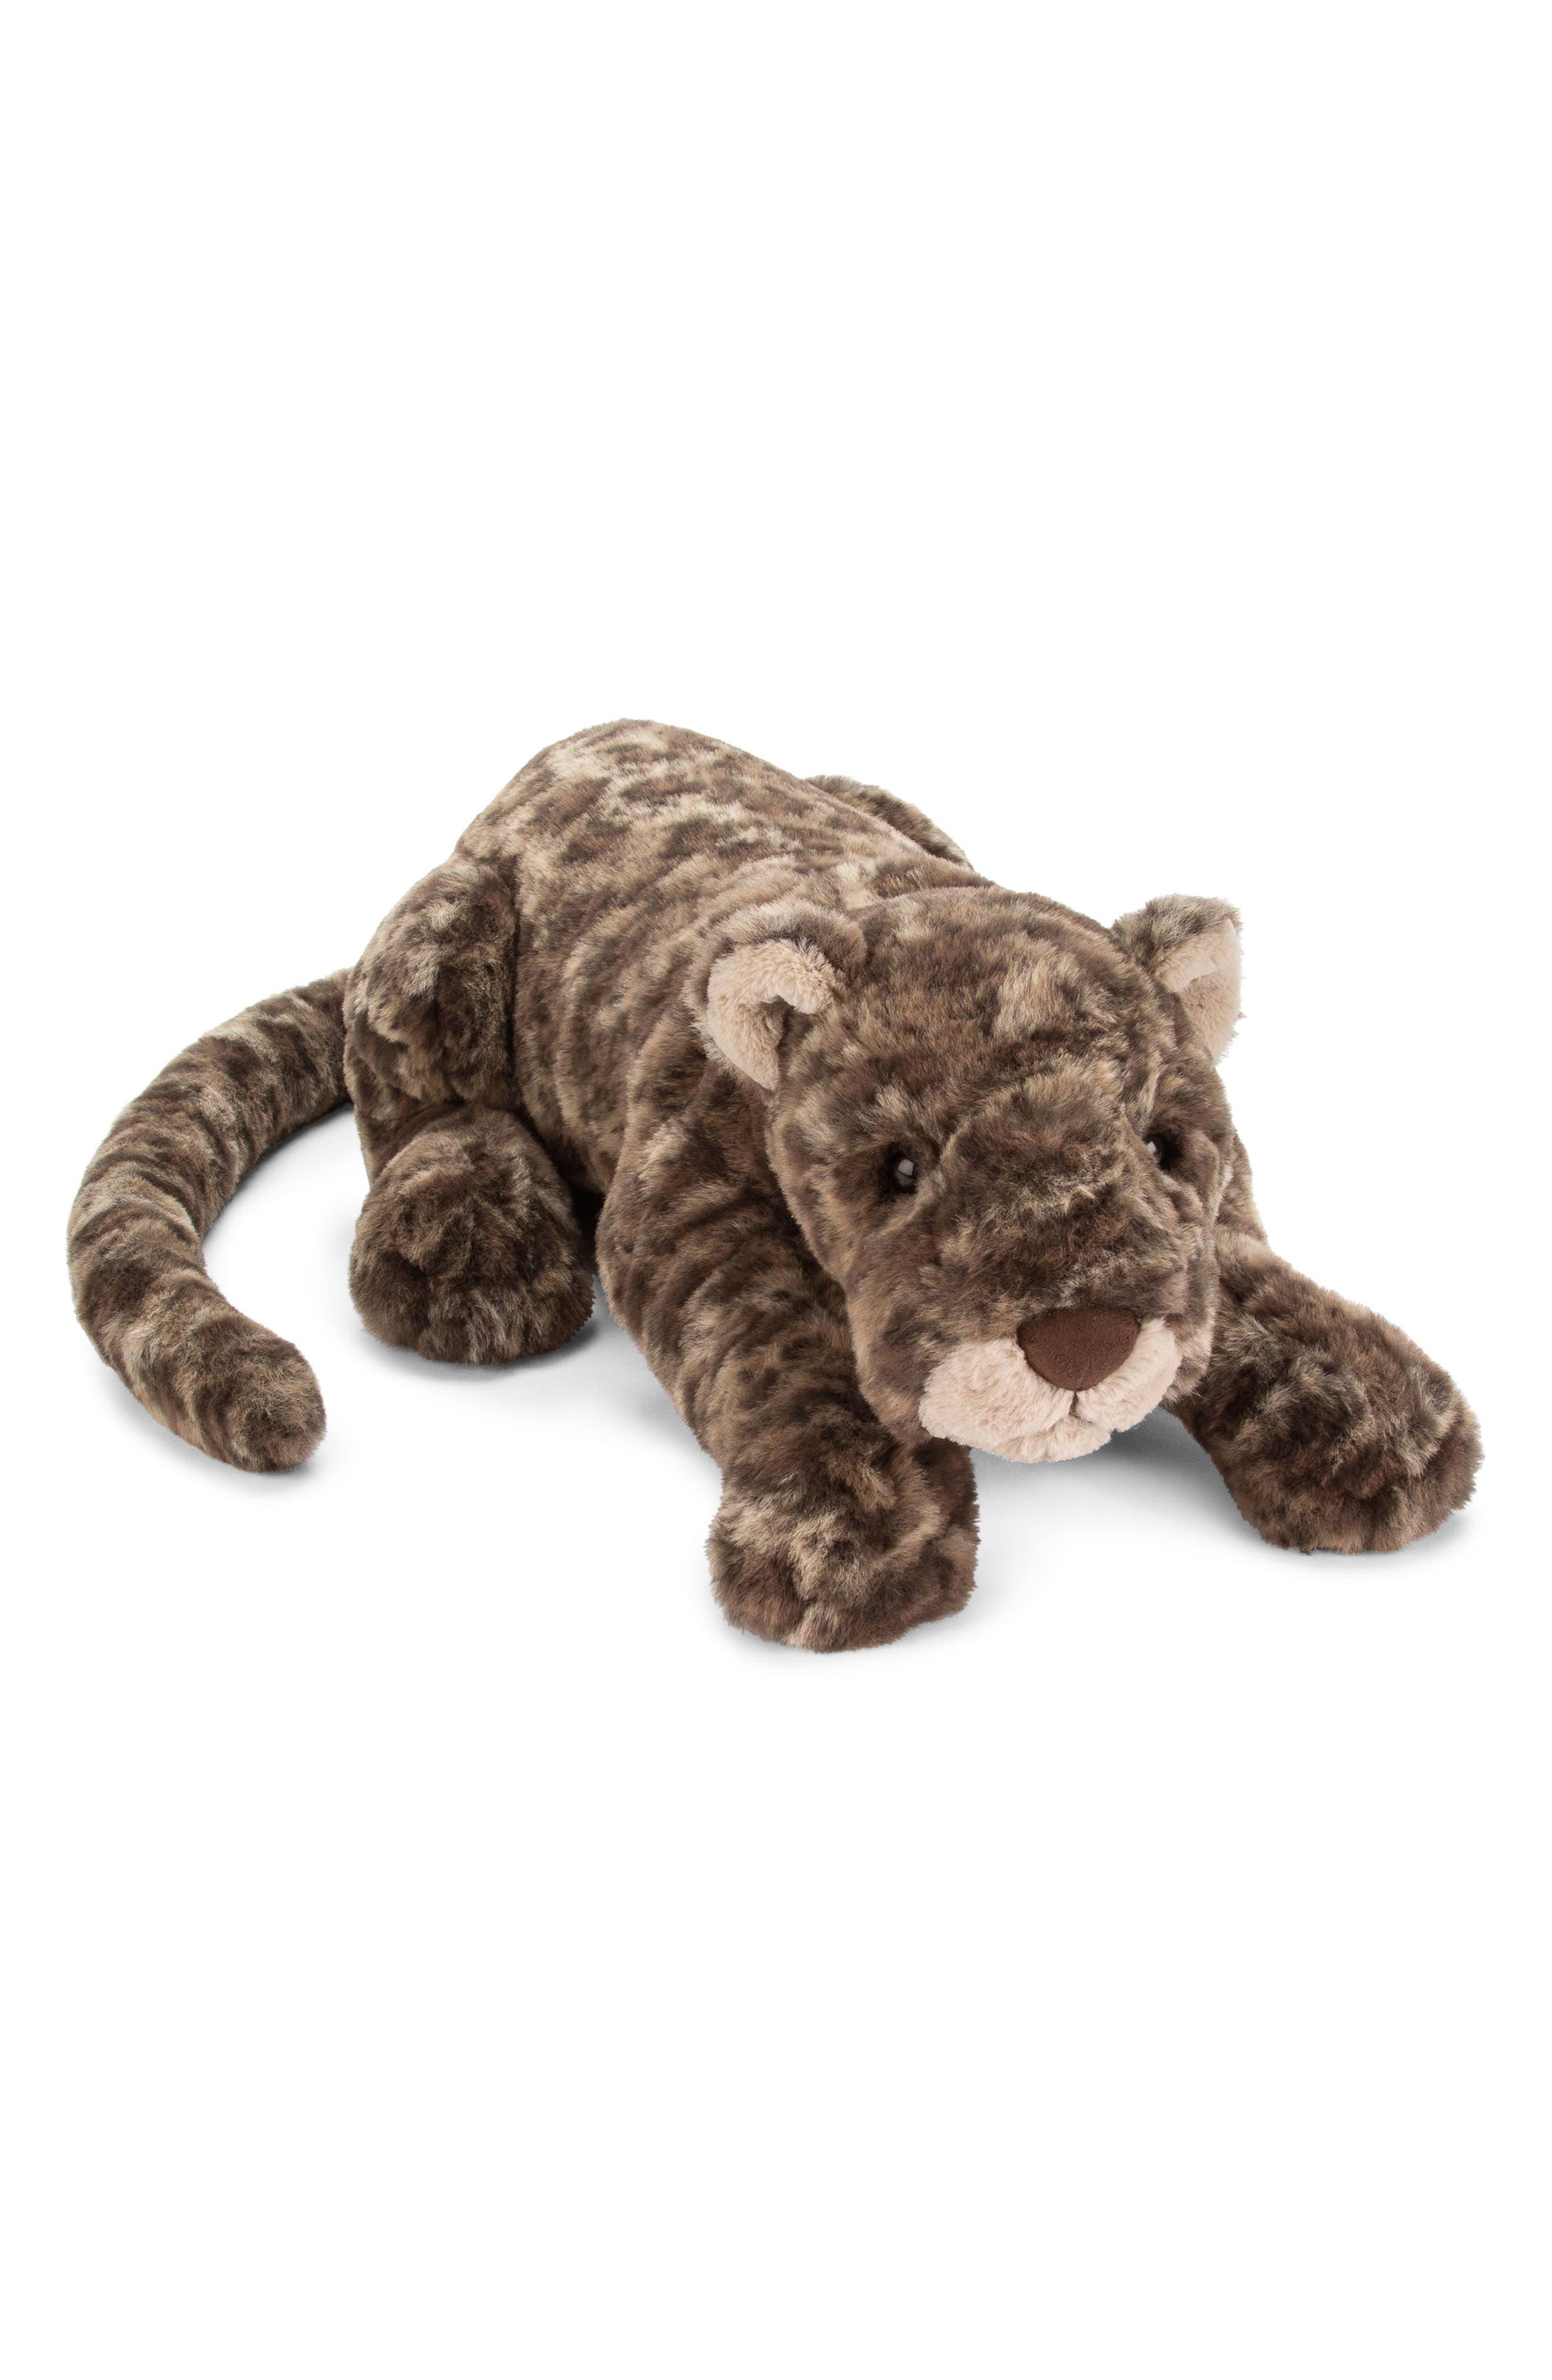 Lexi Leopard Stuffed Animal,                             Main thumbnail 1, color,                             210